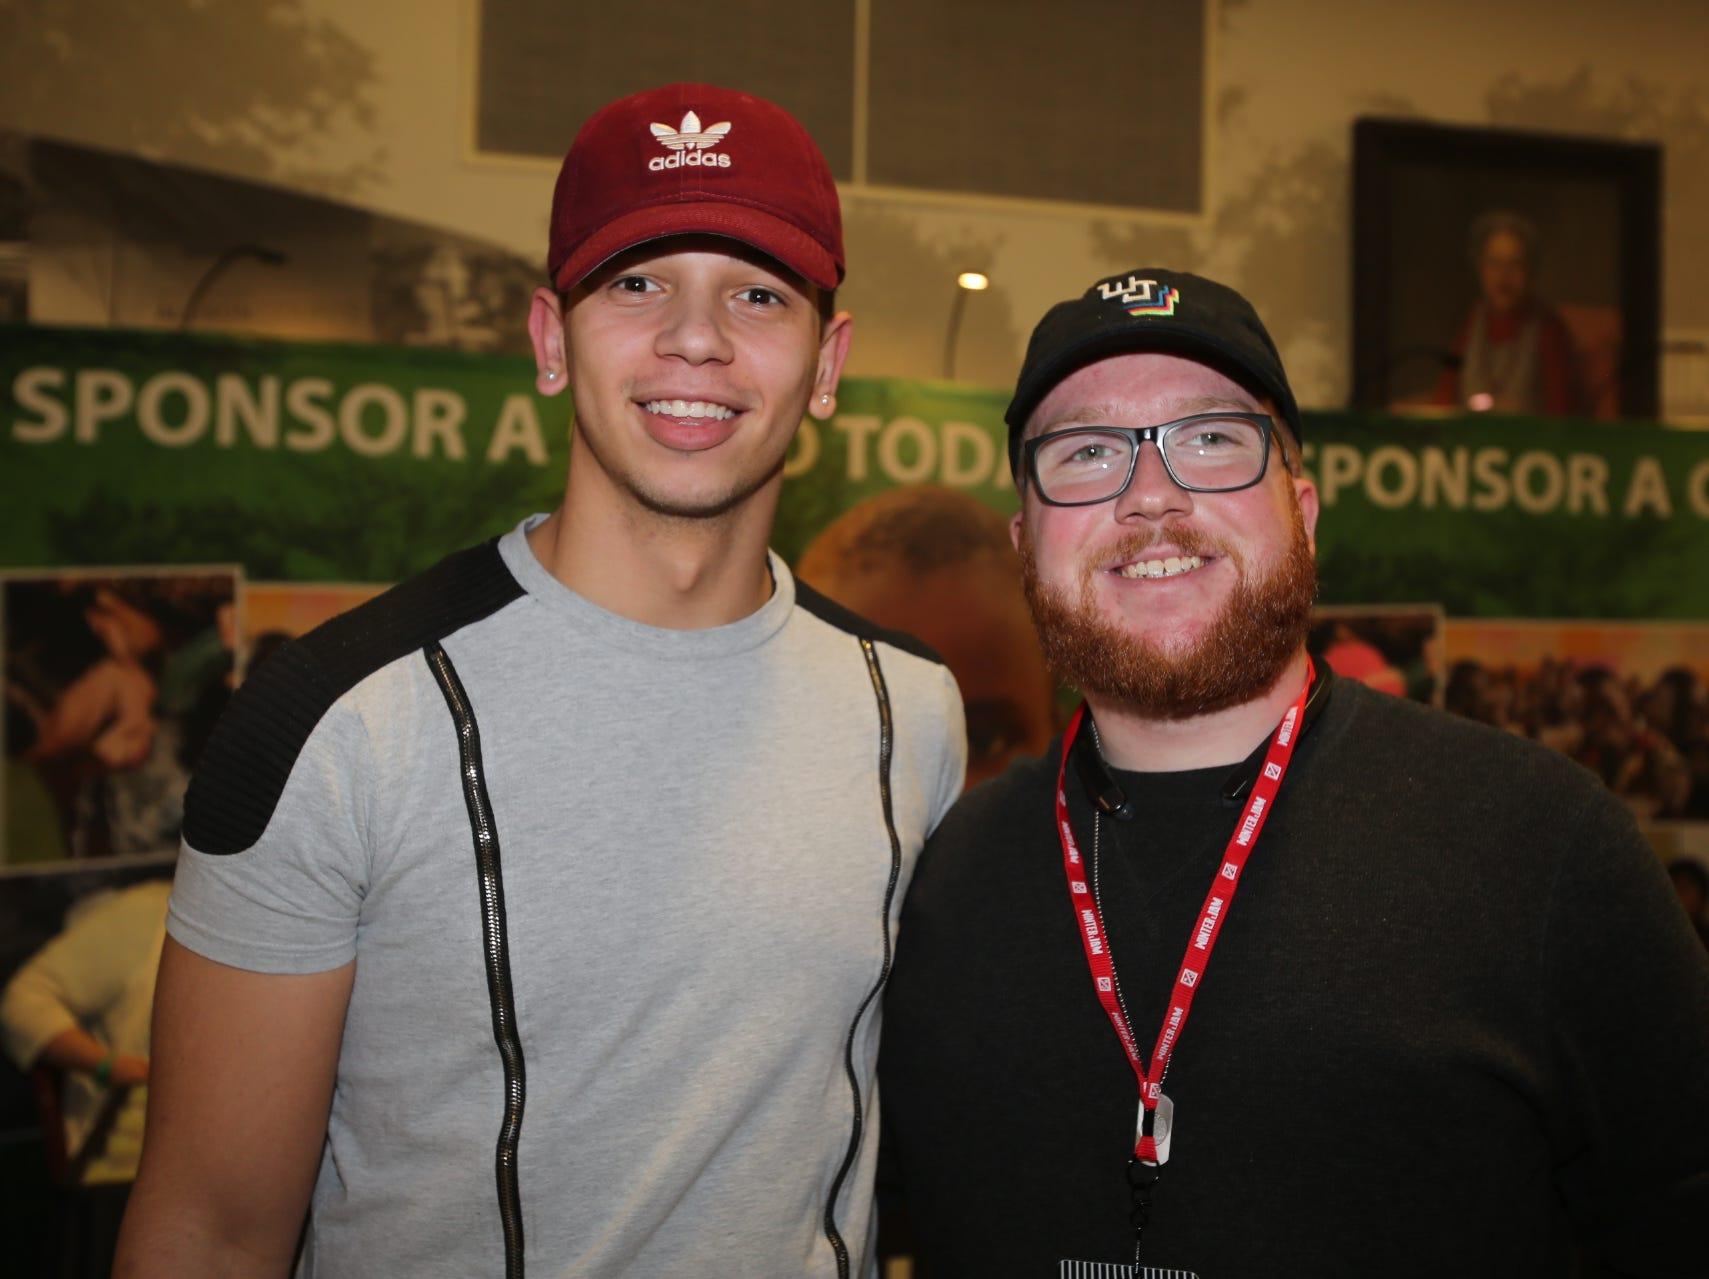 Joshua McGeough and Michael Creech